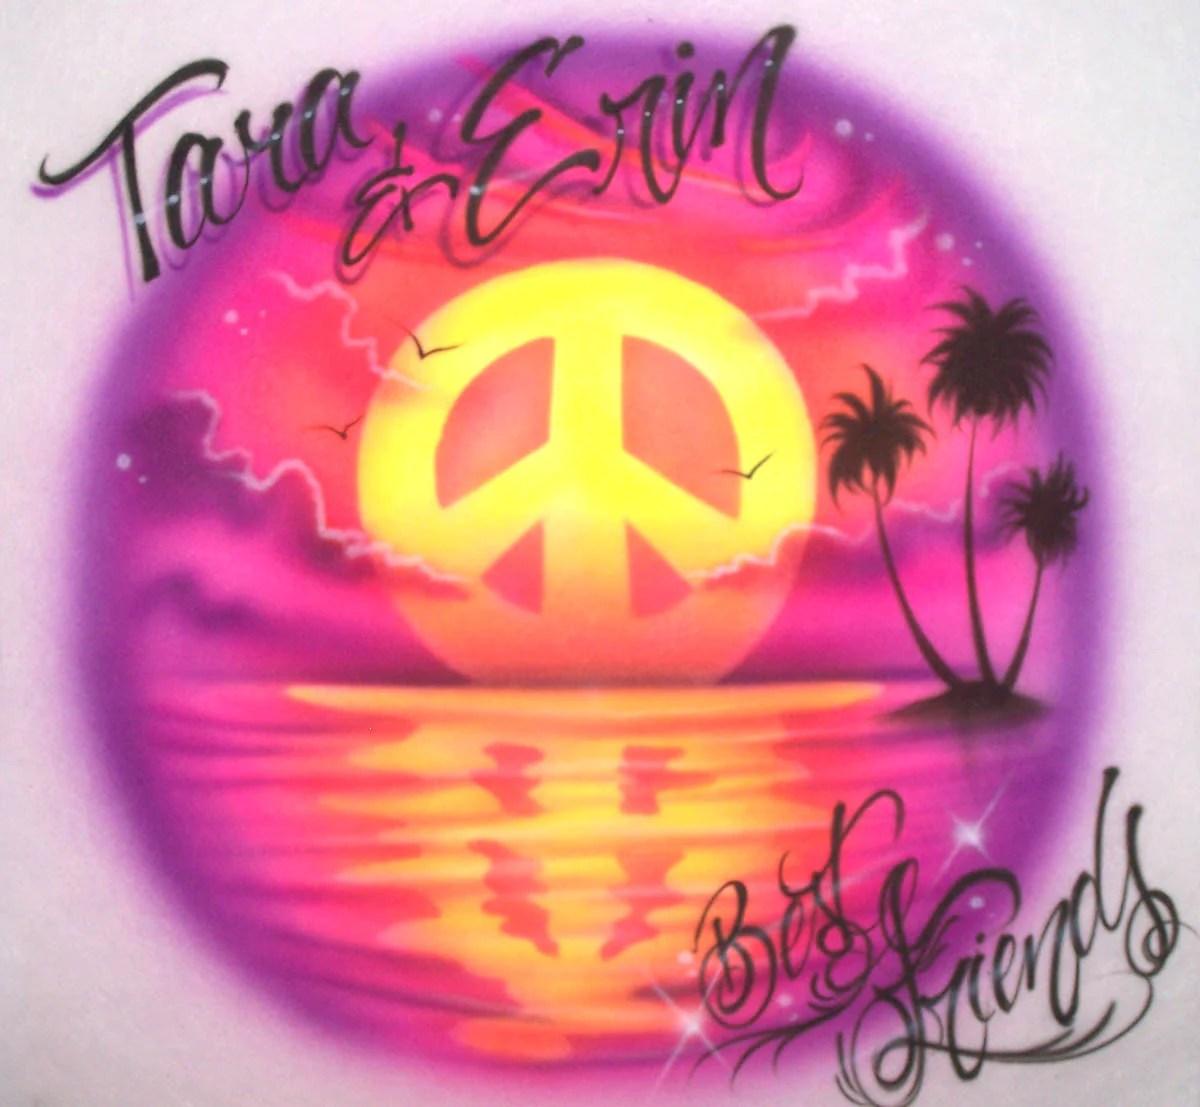 Friends Beach Scene & Peace Sign Sunset Airbrushed Design